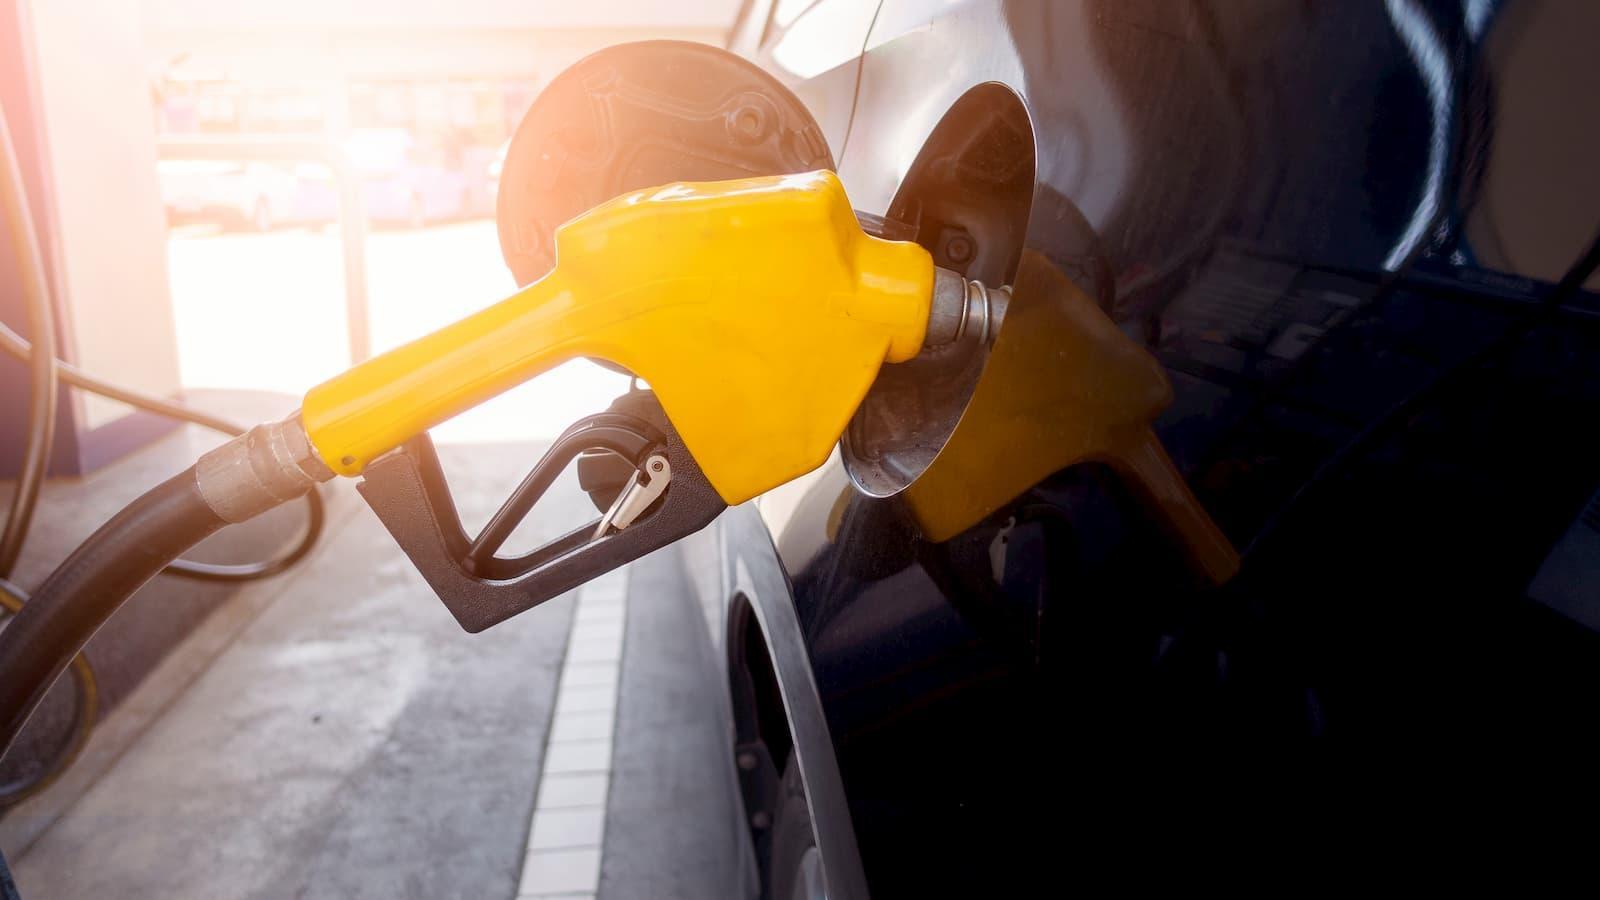 Qatar Petroleum announces fuel prices for August 2020